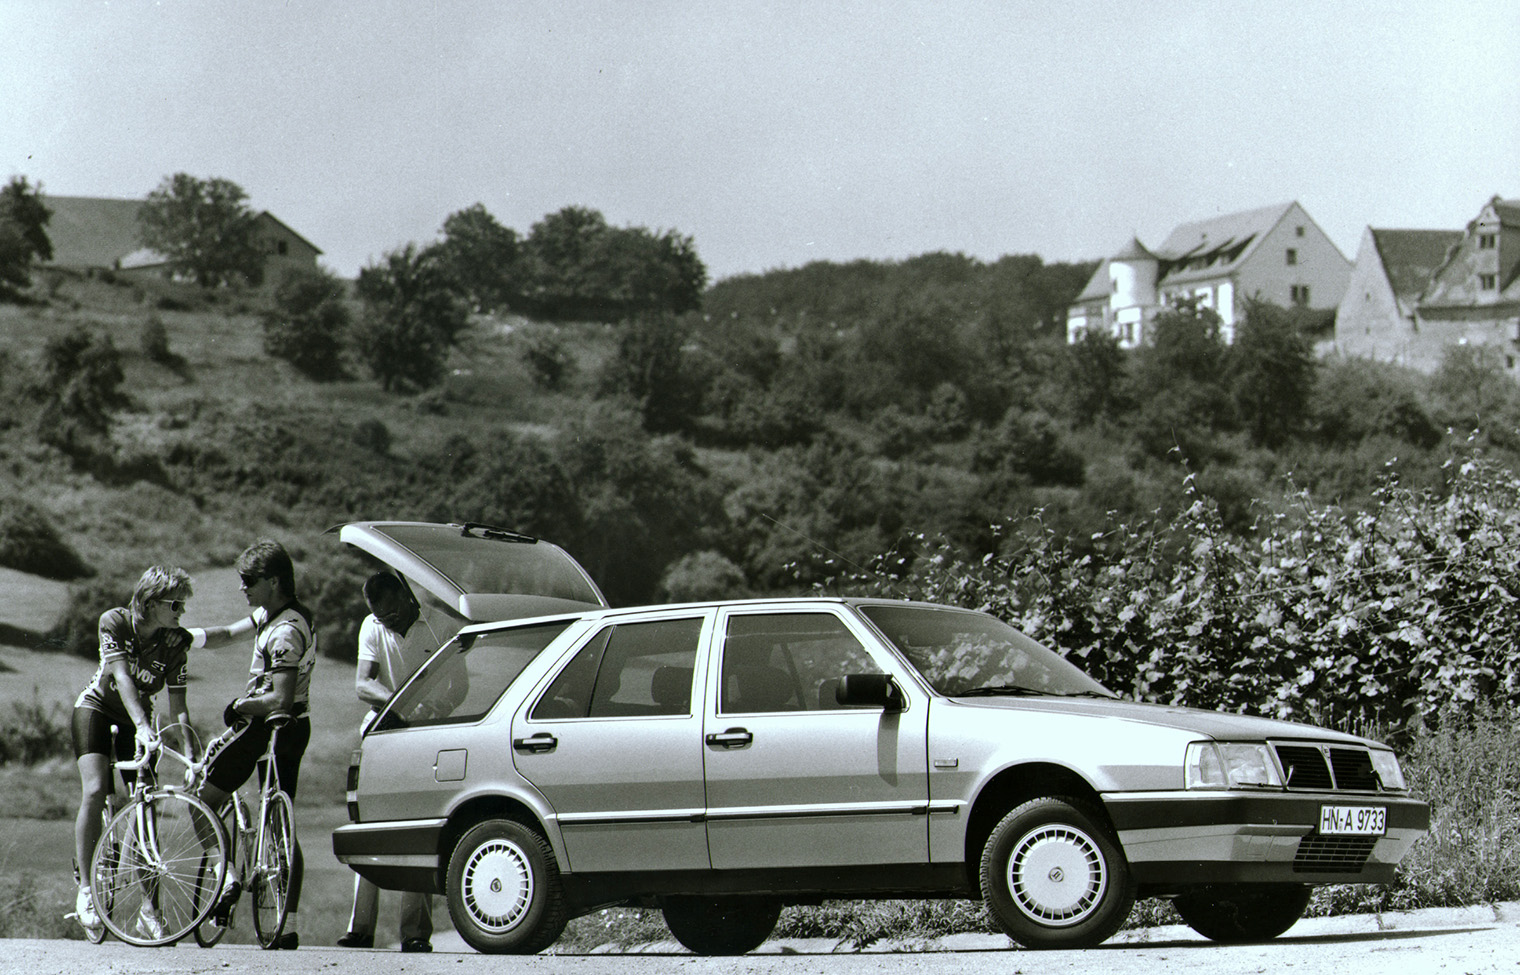 http://kraniel.com/wp-content/uploads/2014/02/LHA138-Thema-S.W.-2.4-Turbodiesel-S-1.-Serie-1986-1988.jpg